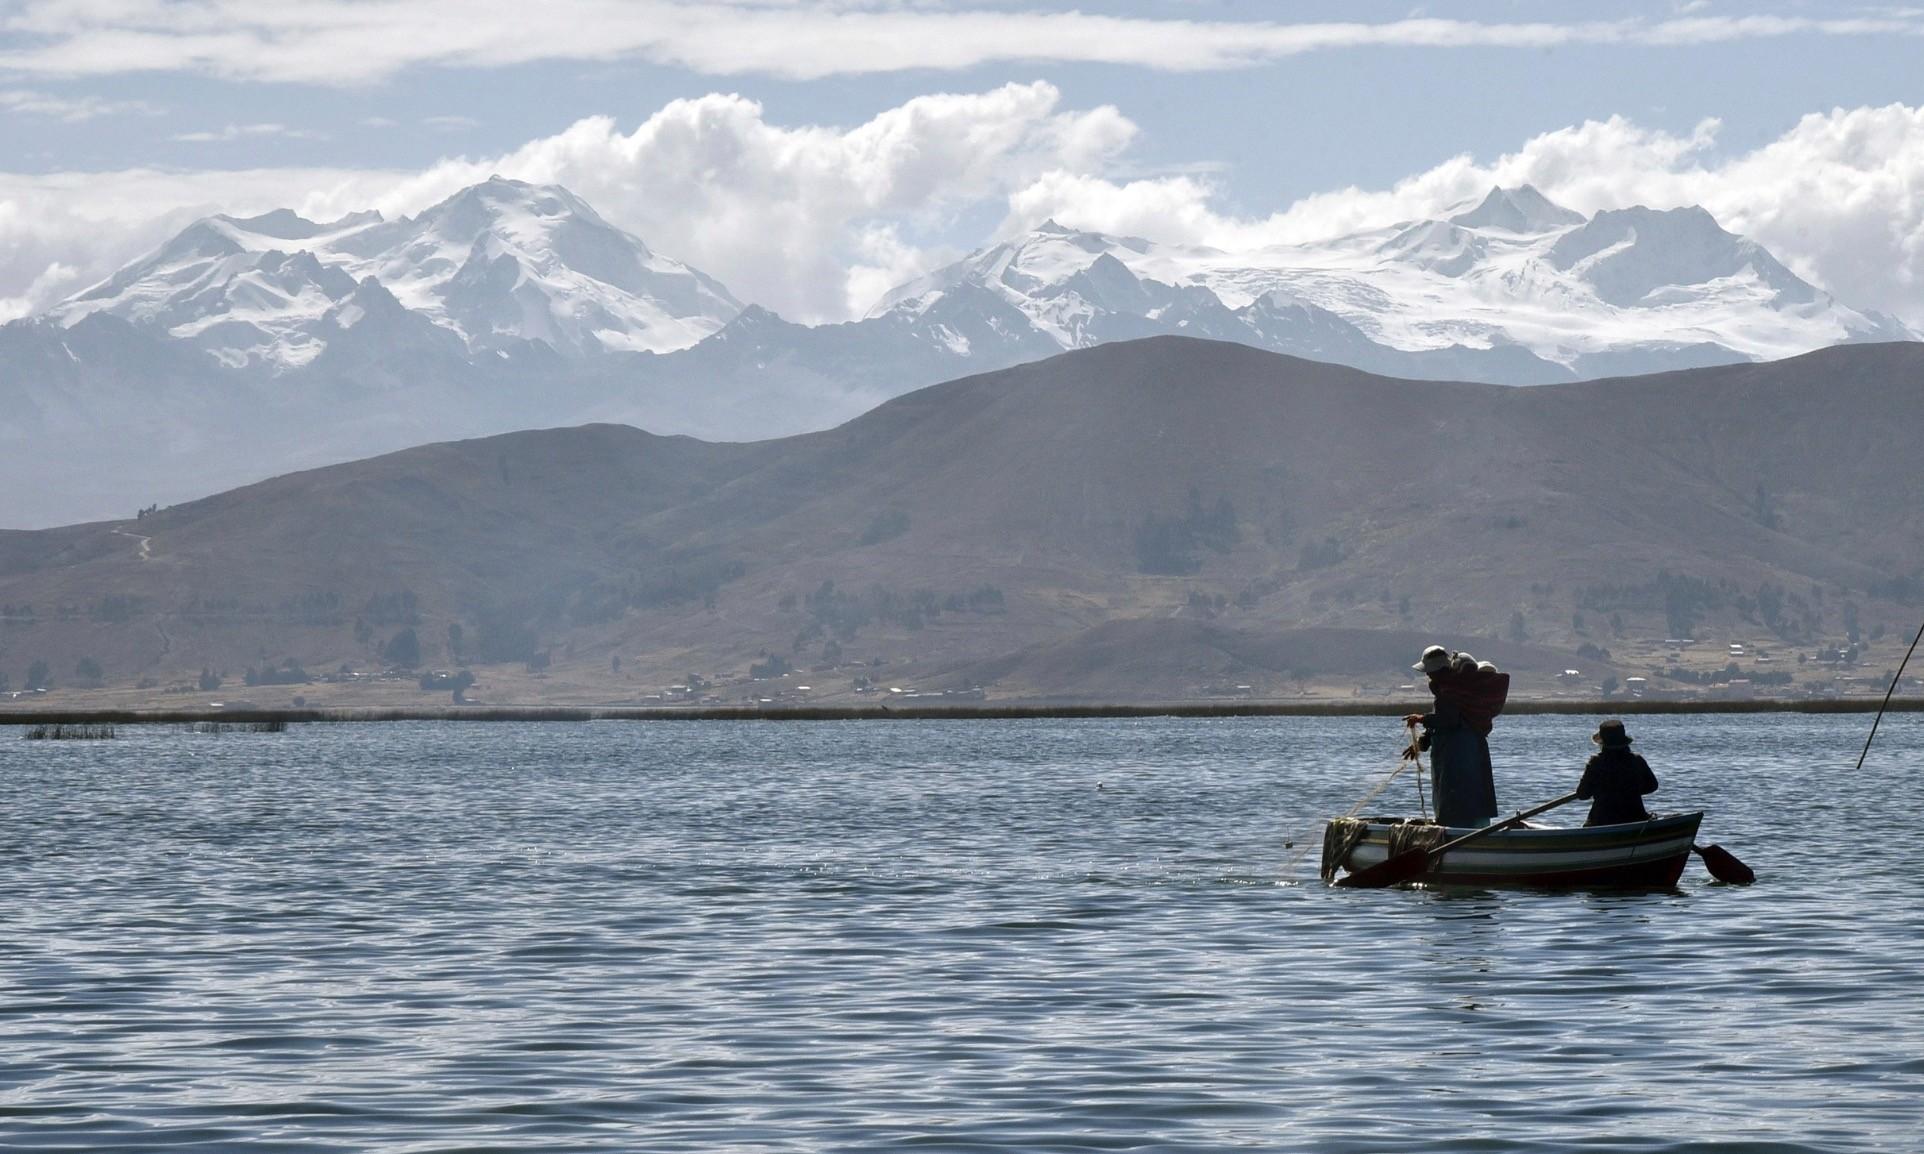 Aymara indigenous people fish on Lake Titicaca near Quehuaya in Bolivia.